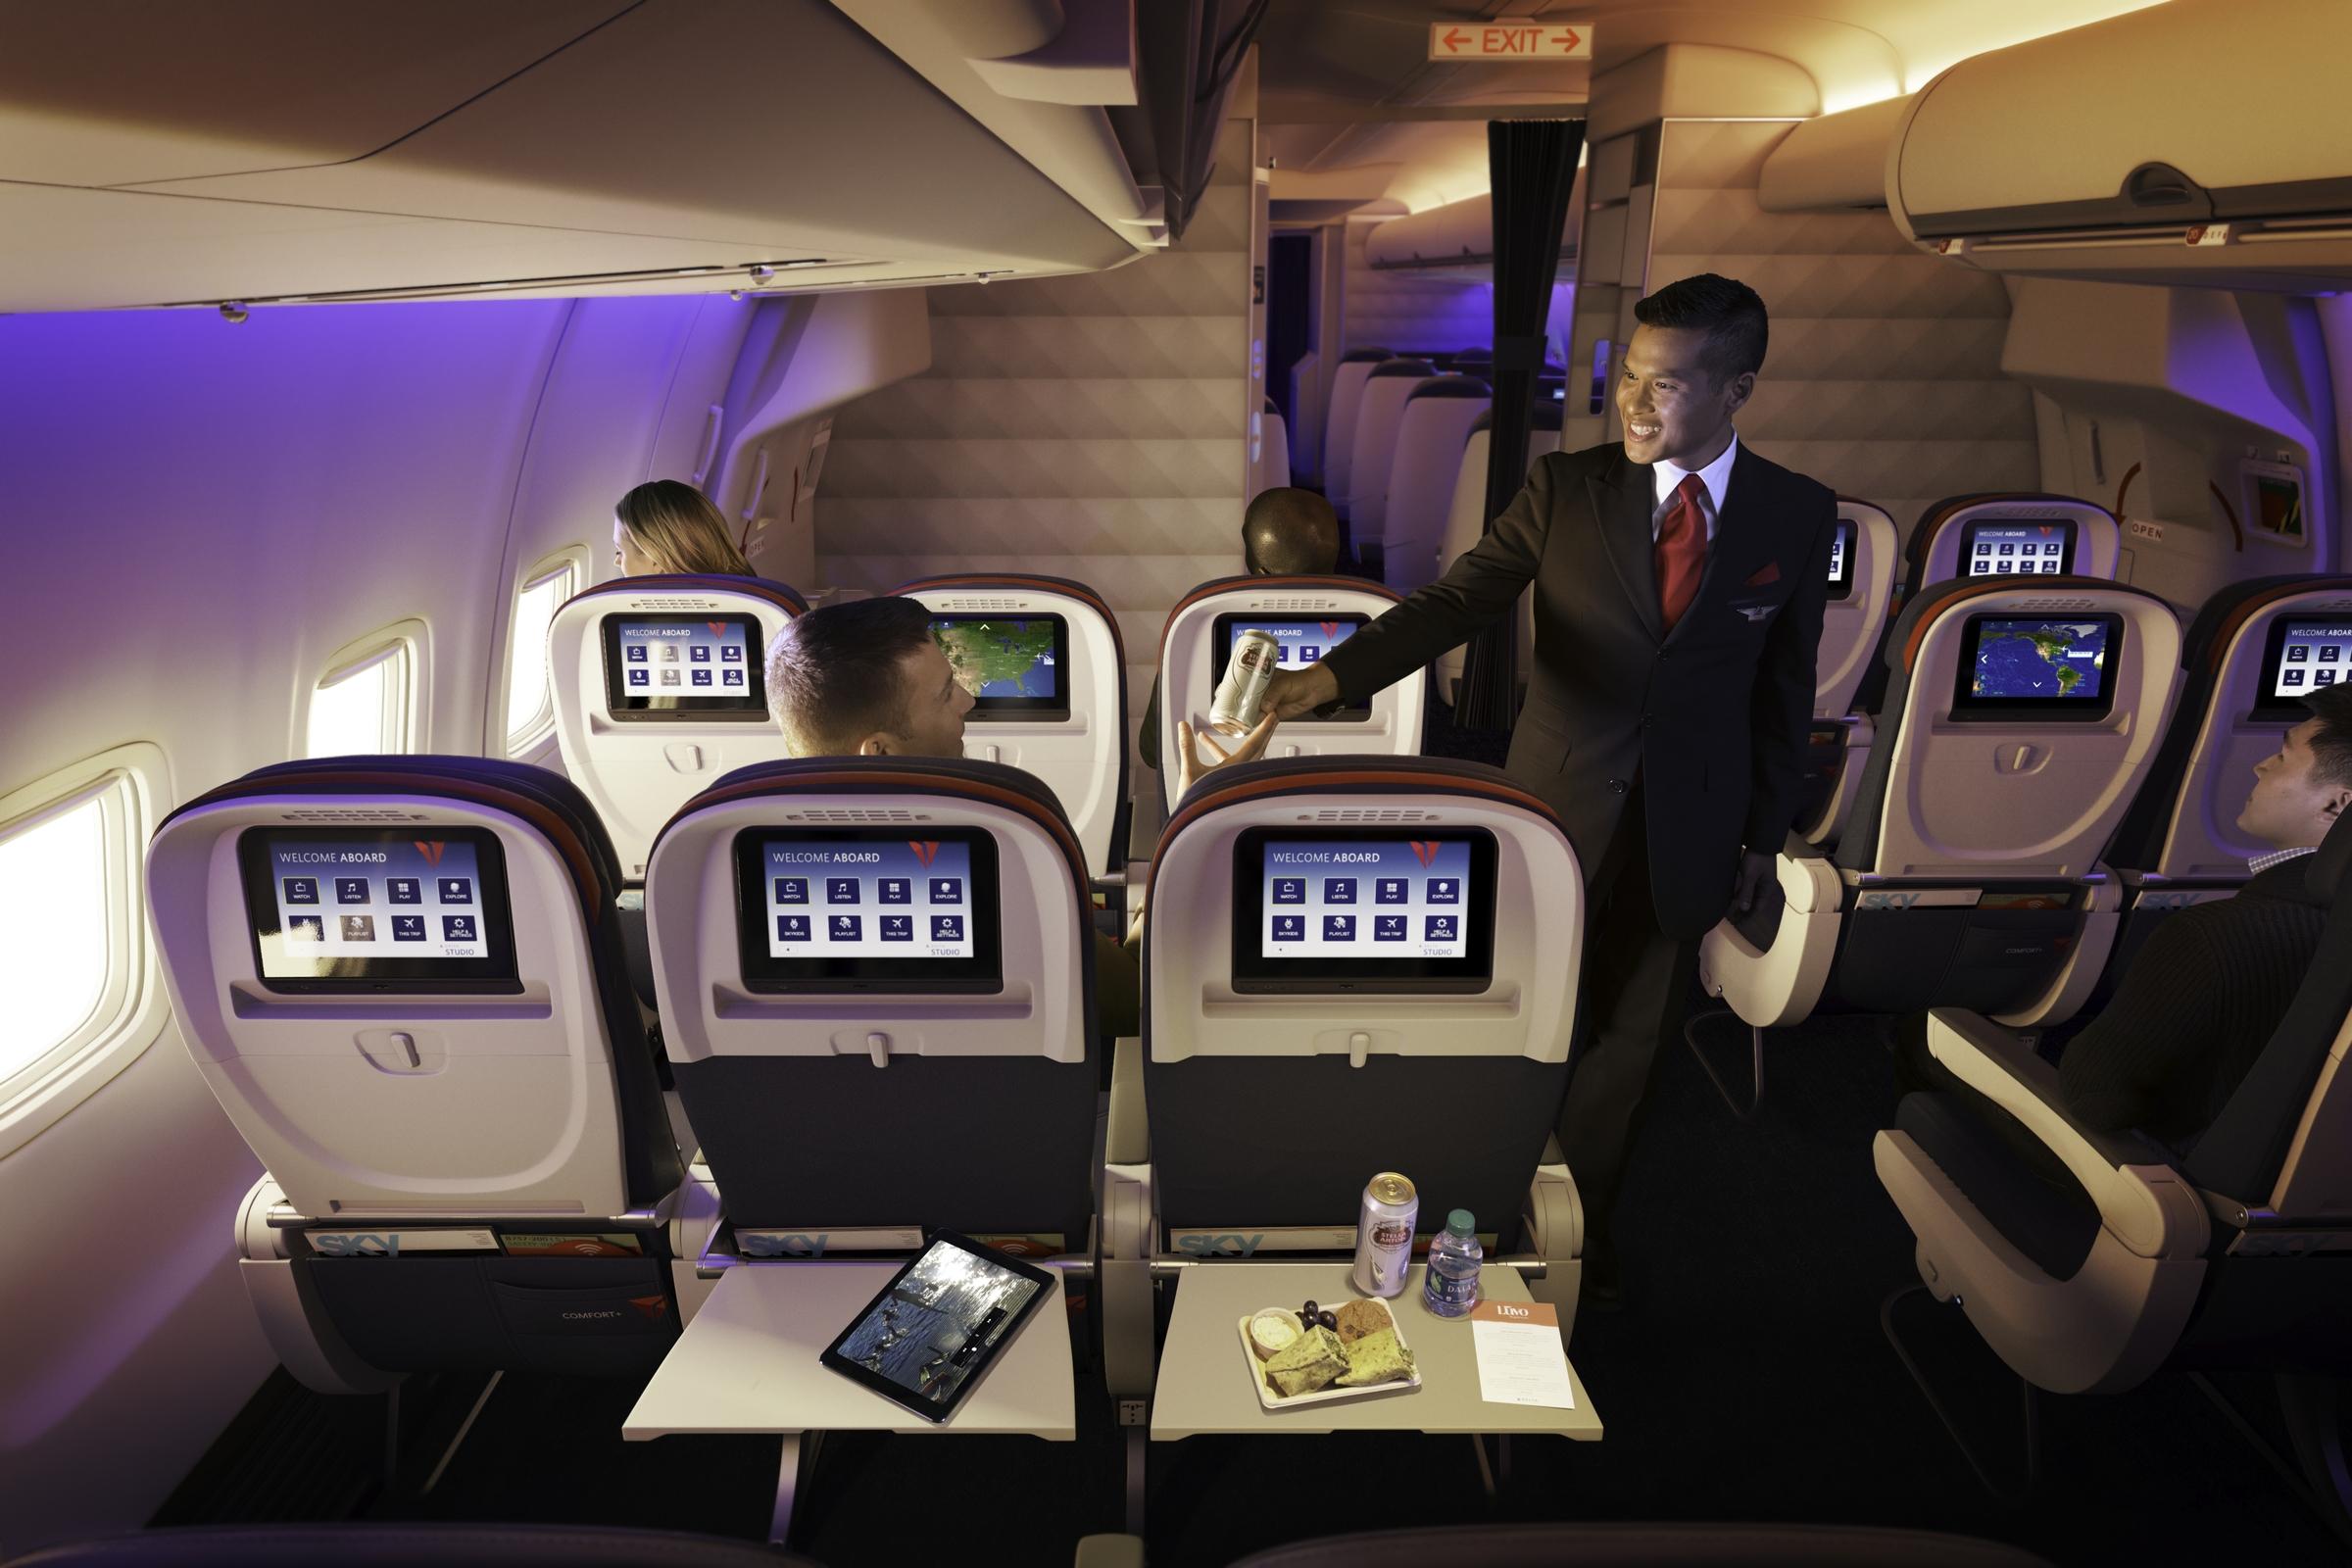 Flight Attendant giving passenger a snack